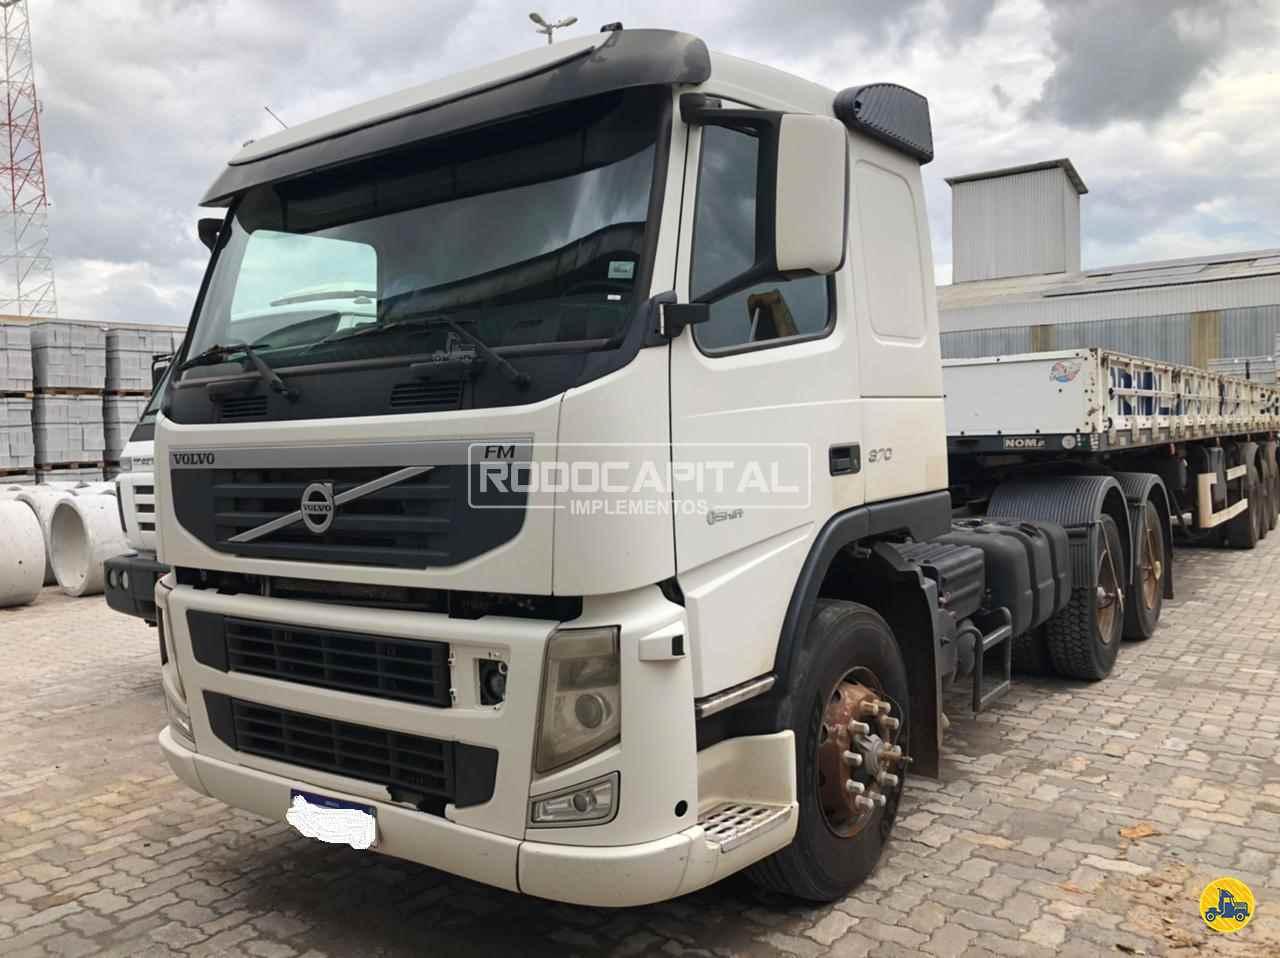 CAMINHAO VOLVO VOLVO FM 370 Cavalo Mecânico Truck 6x2 RODOCAPITAL - TRUCKVAN BRASILIA DISTRITO FEDERAL DF